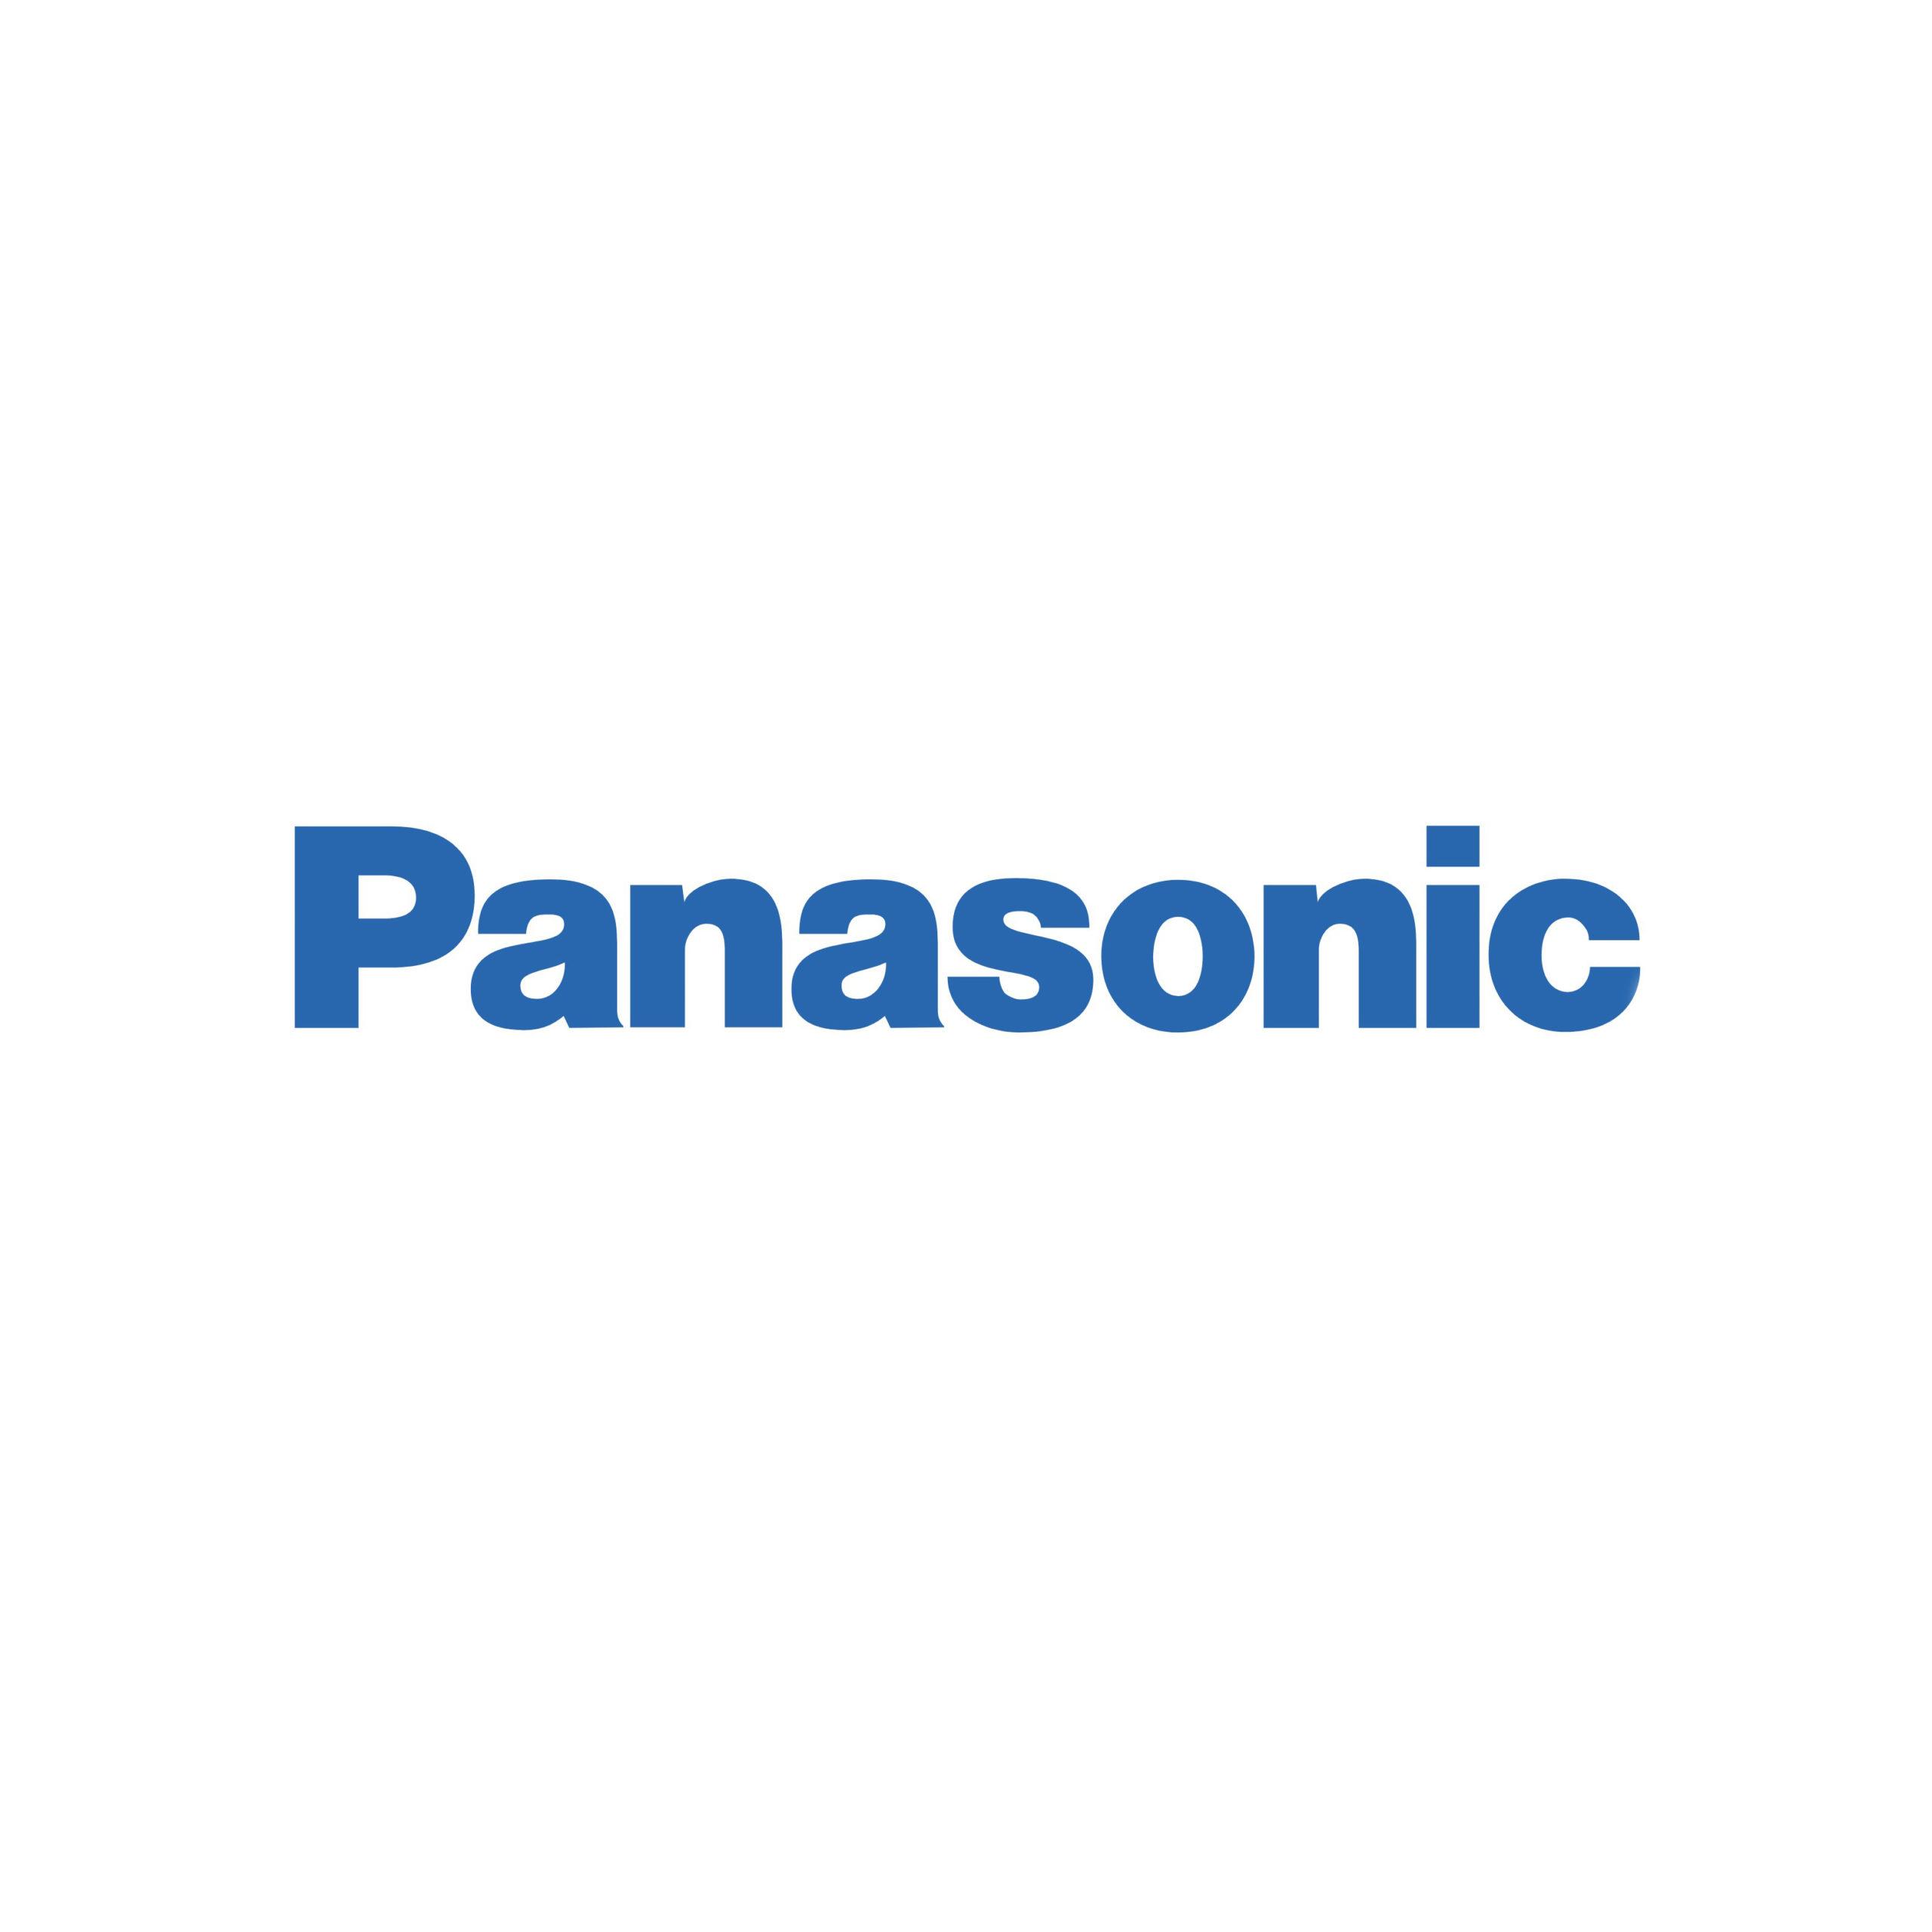 Sejarah Panasonic